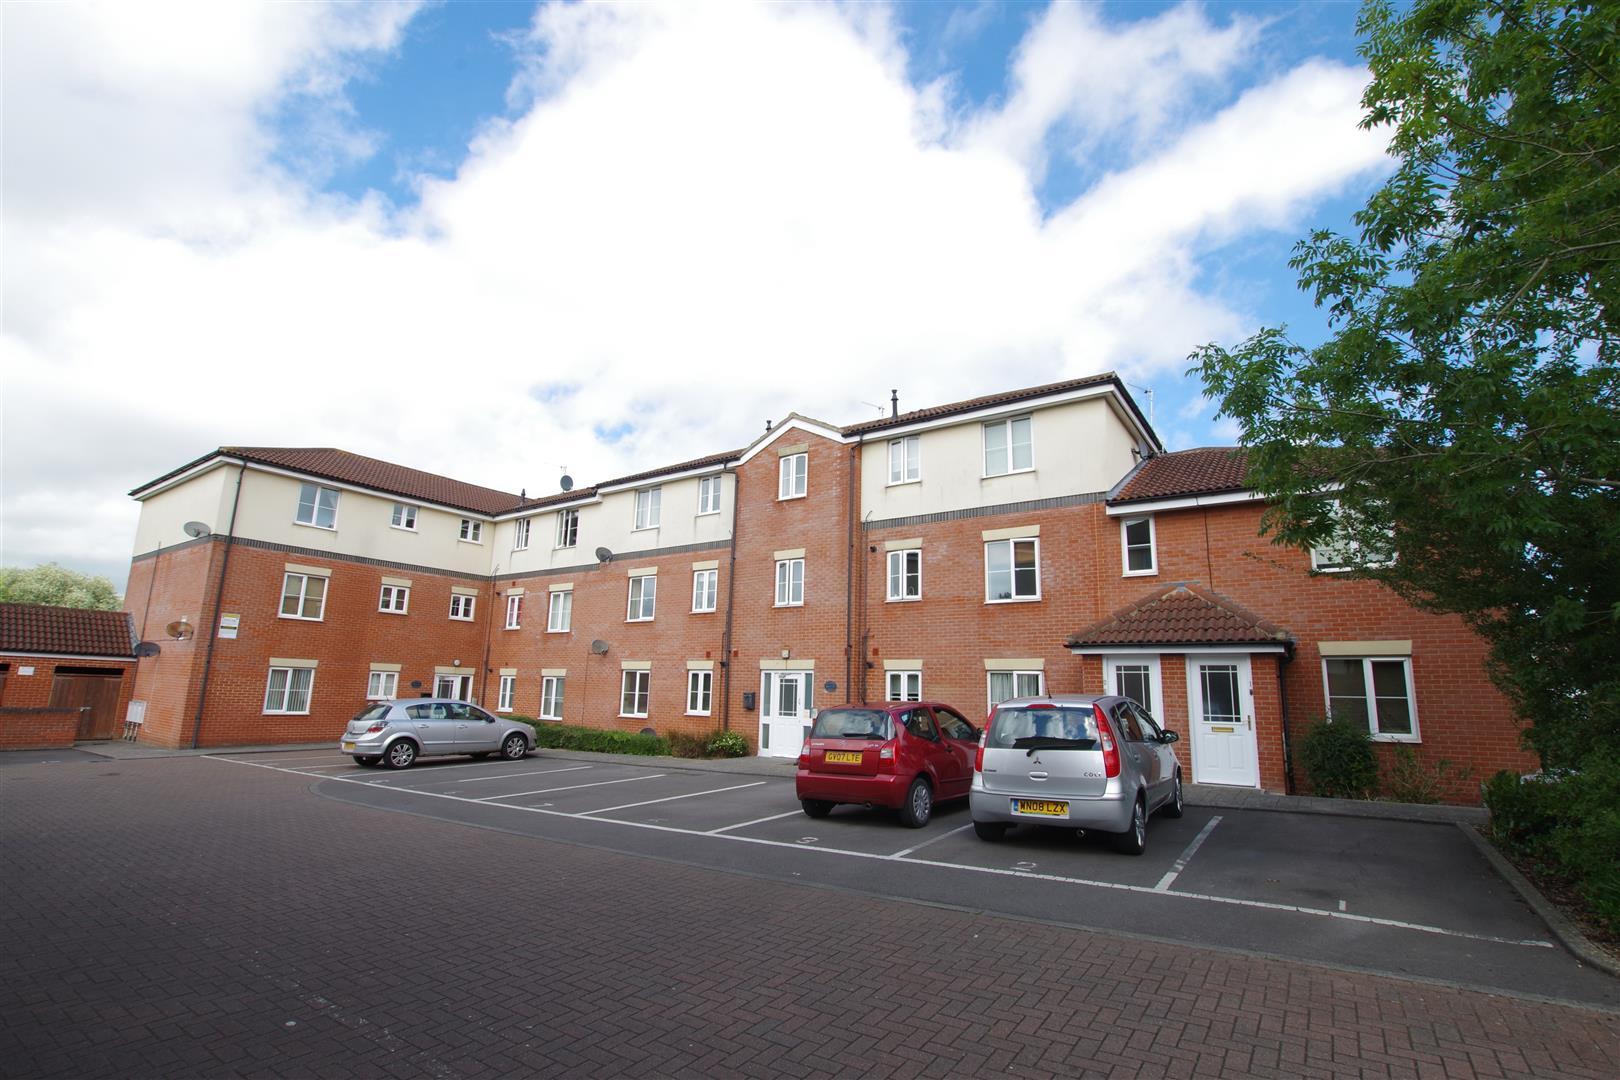 Redcliffe Street, Rodbourne, Swindon